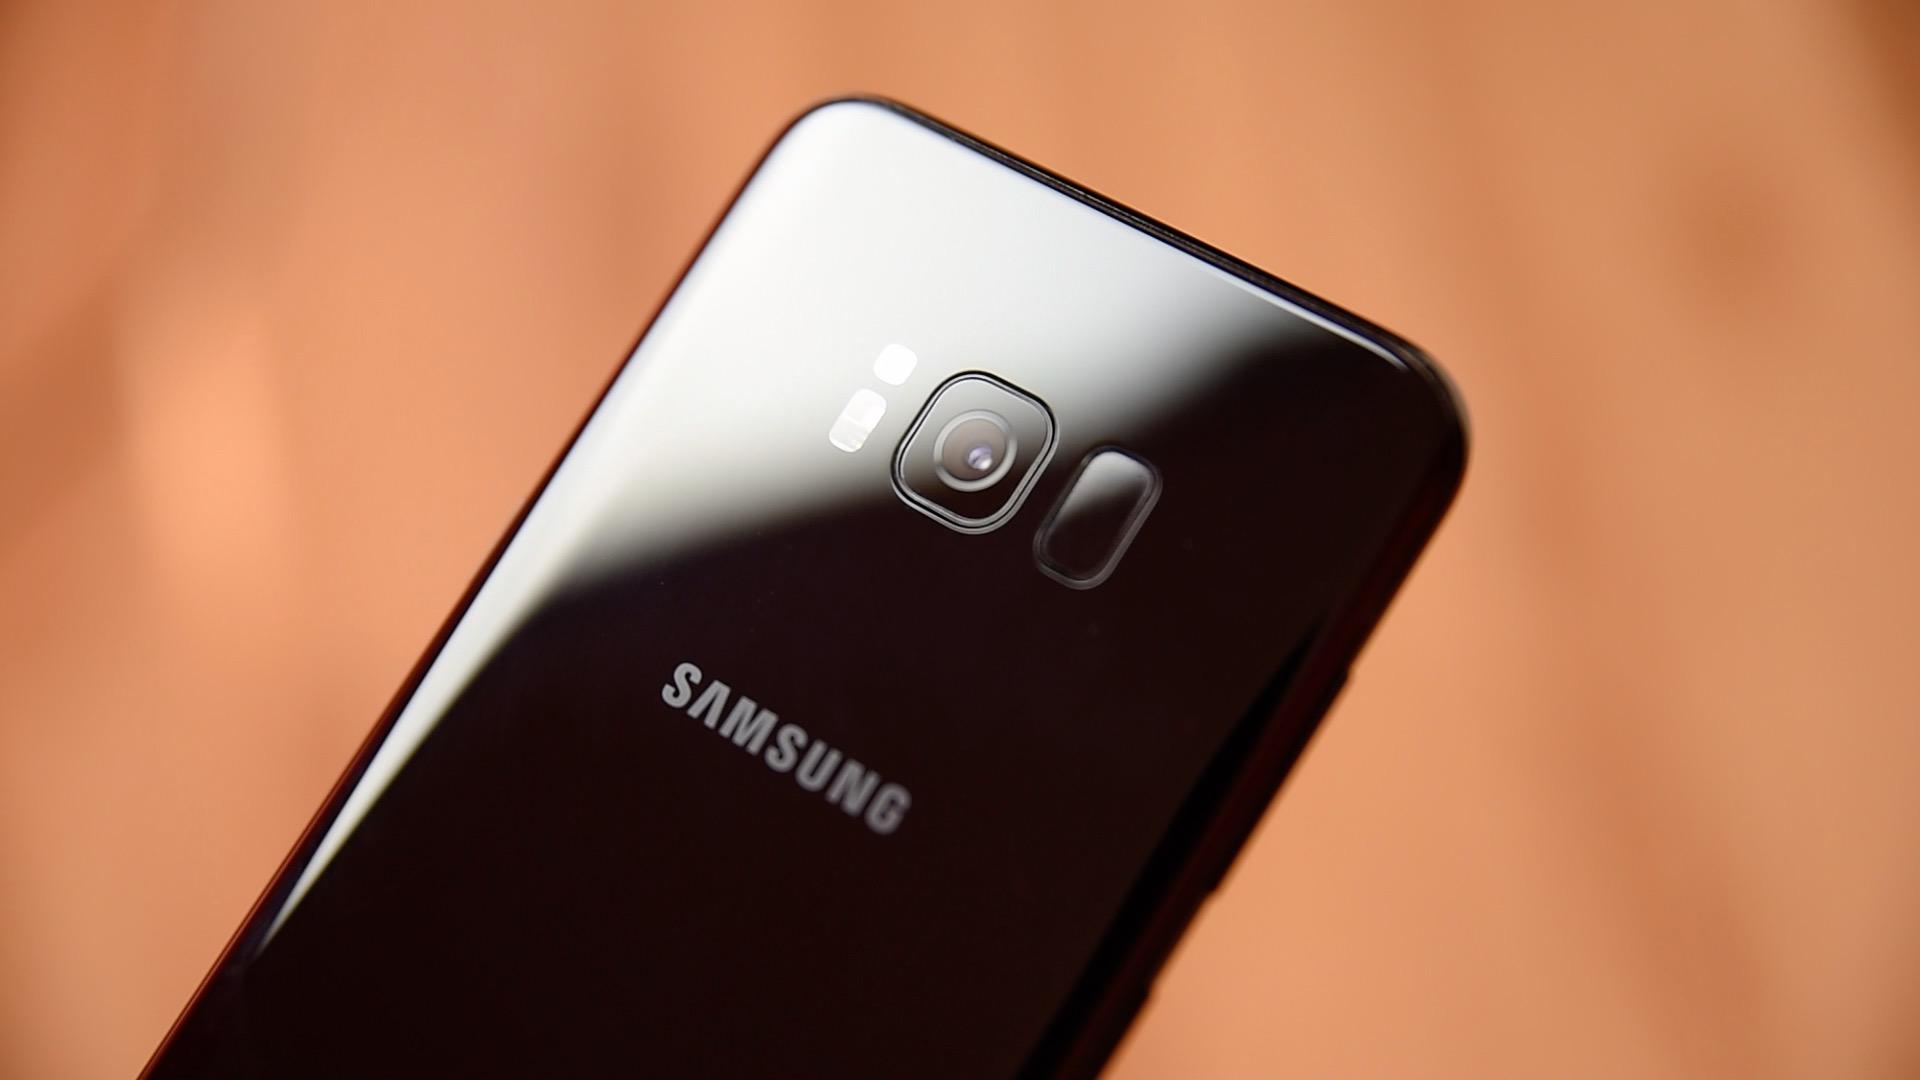 samsung galaxy s8 plus - recenzja